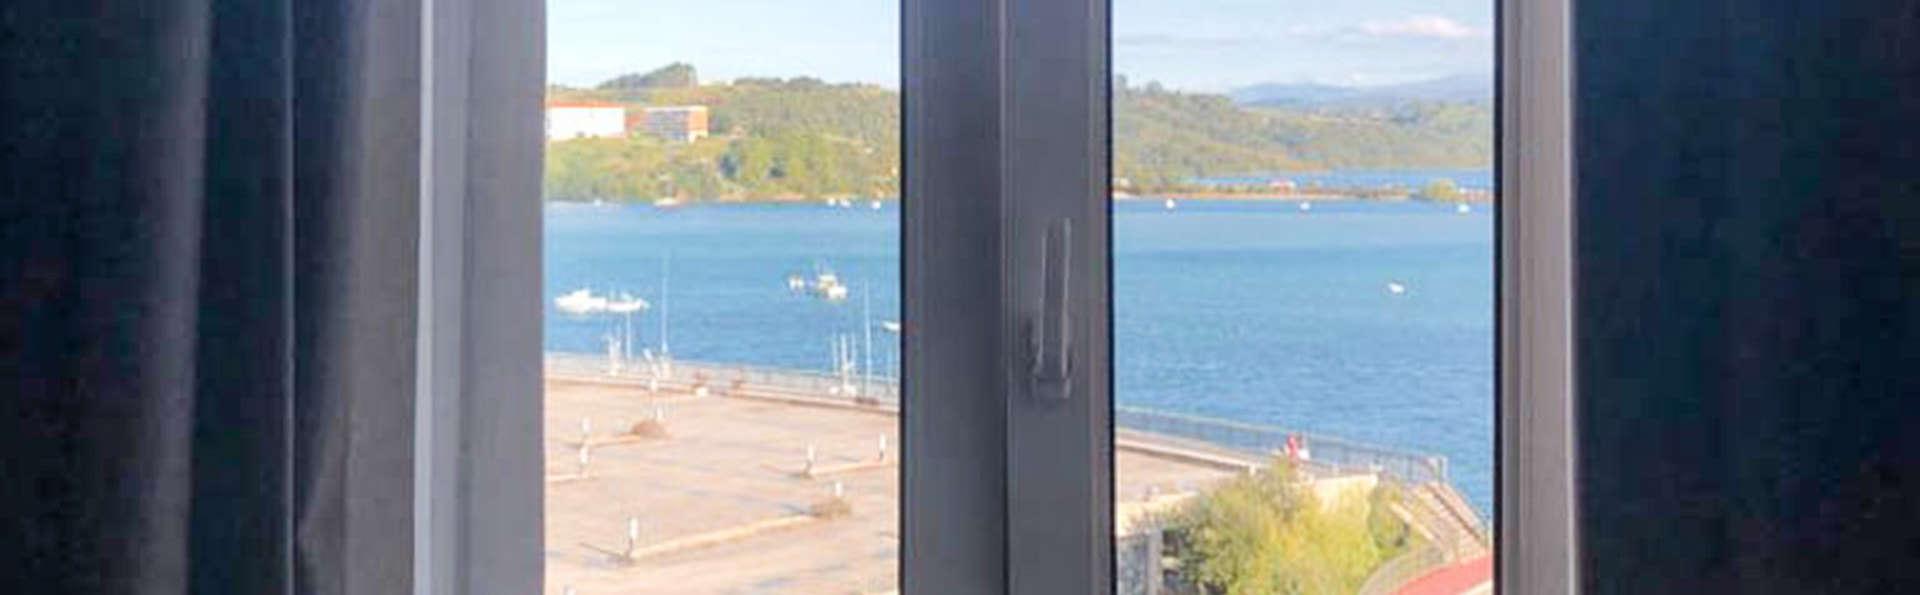 Faro de San Vicente - EDIT_Daylighting_01.jpg